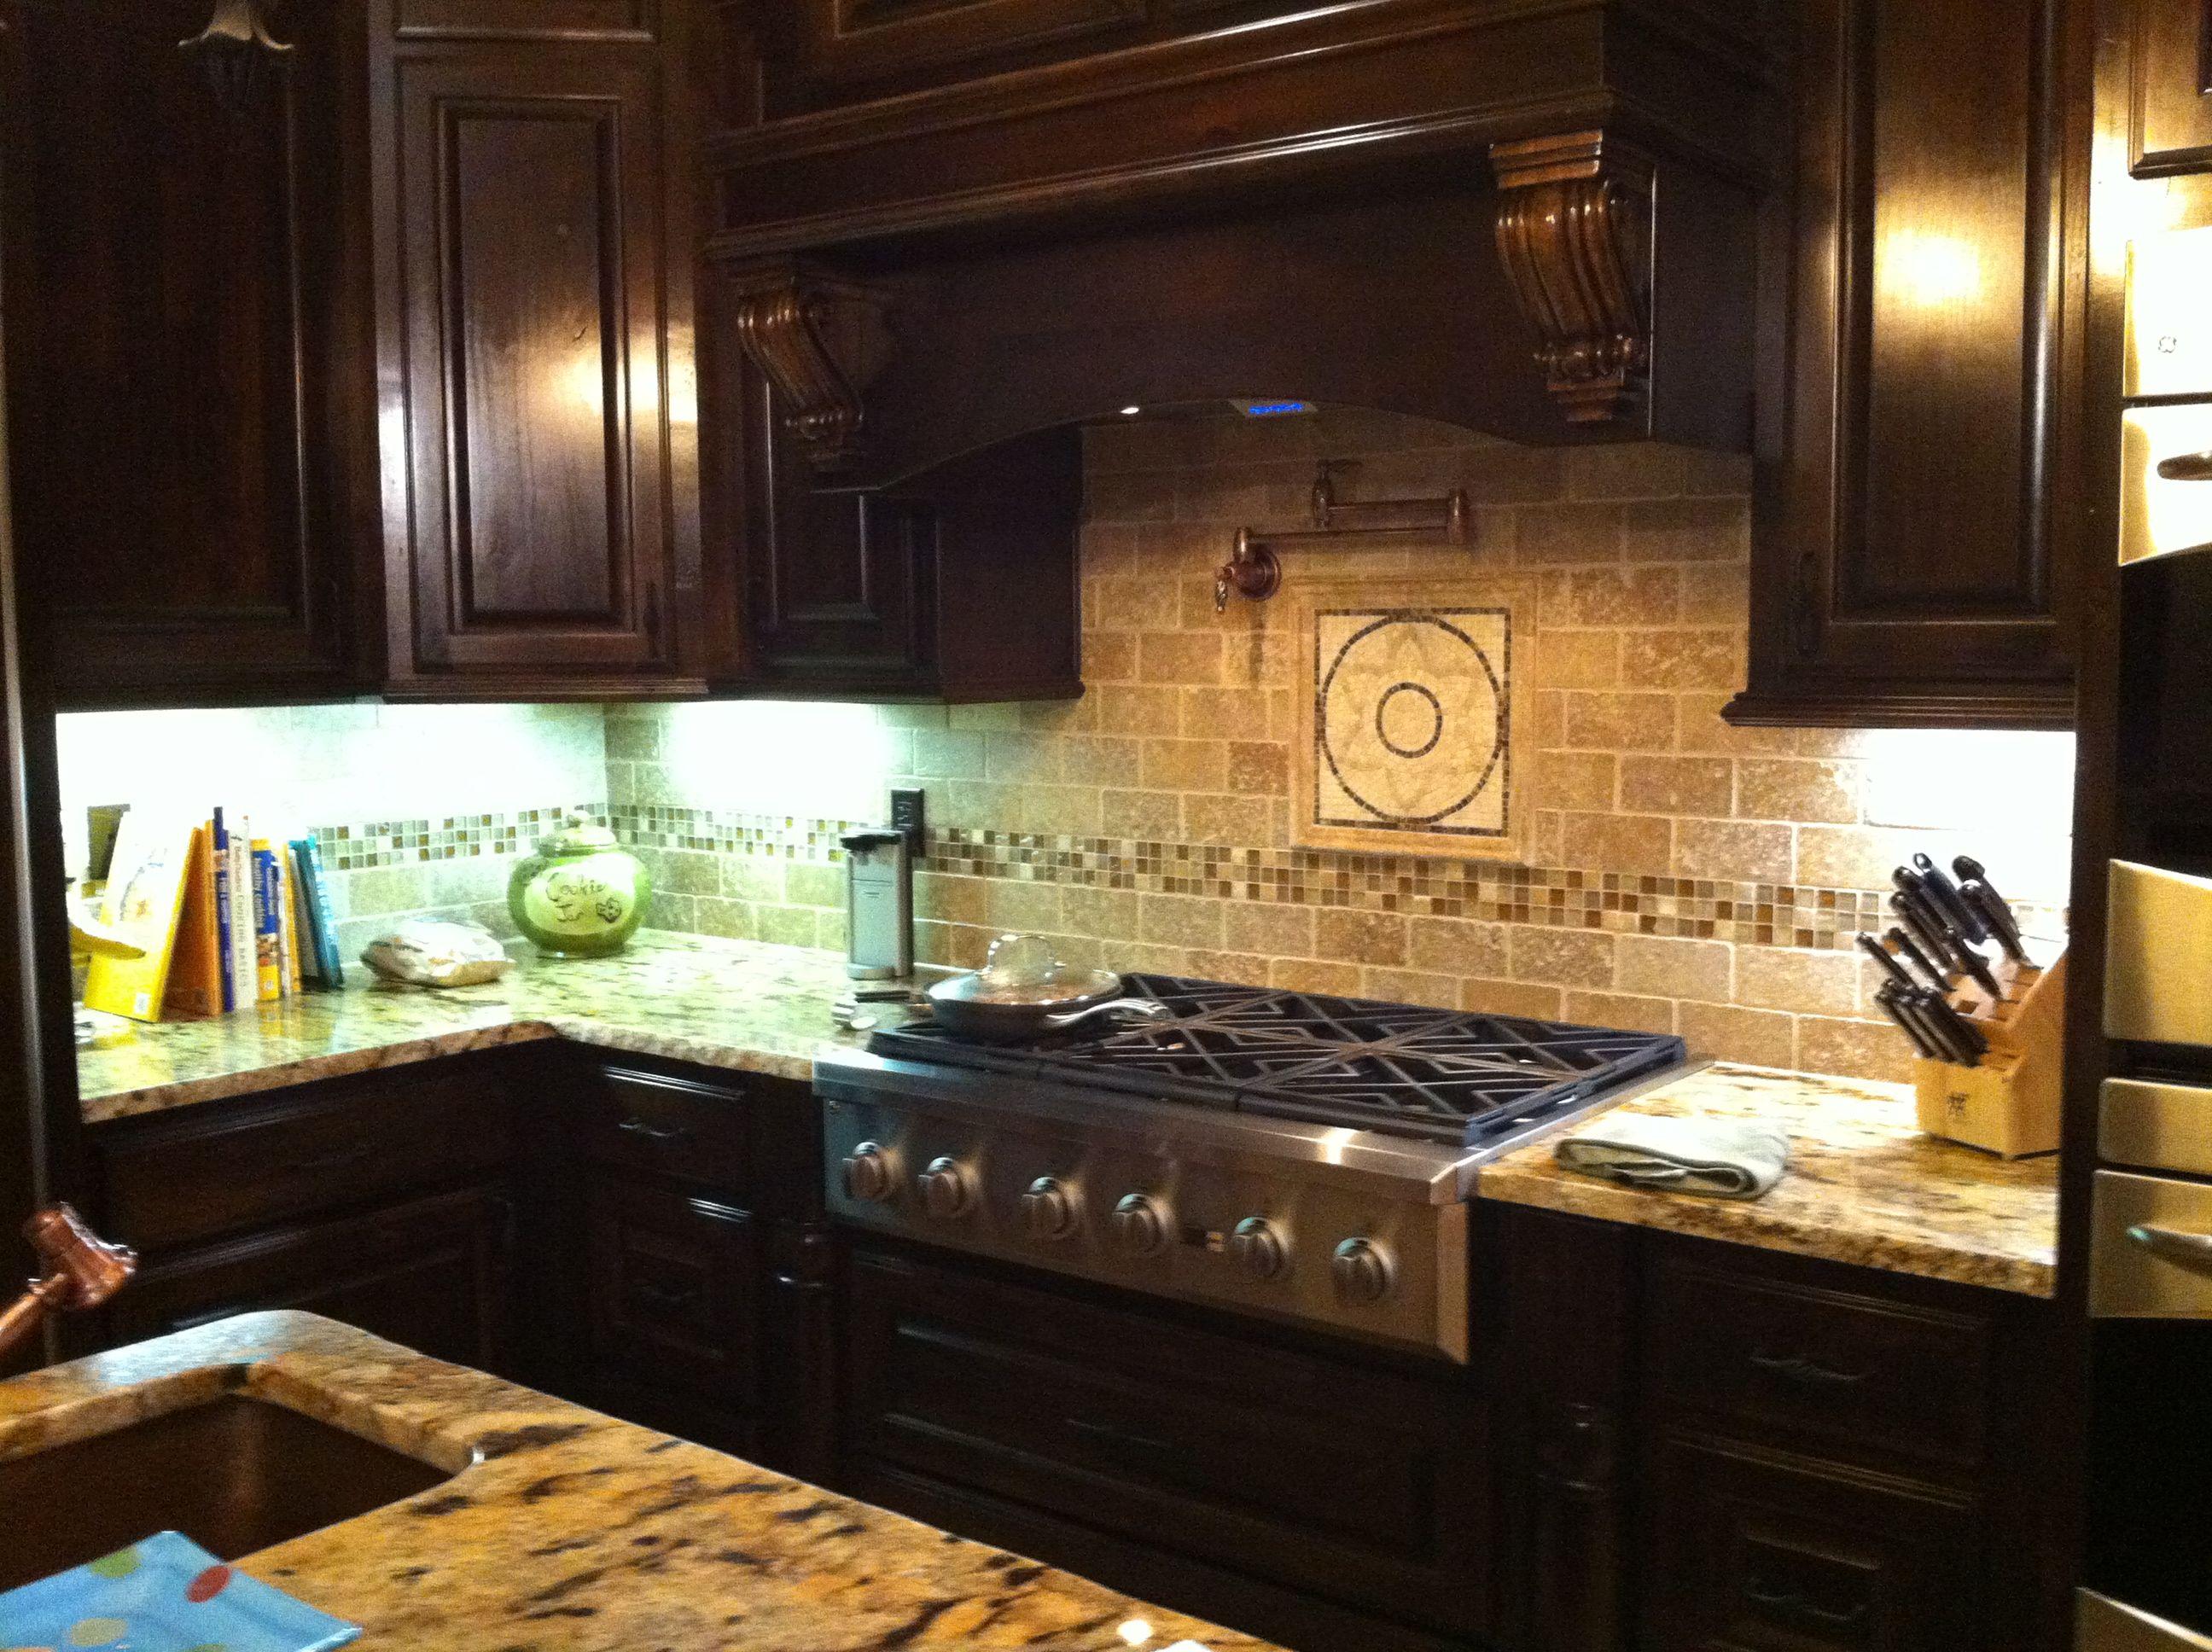 - 3x6 Noce Travertine Kitchen Backsplash The Stone Link Design